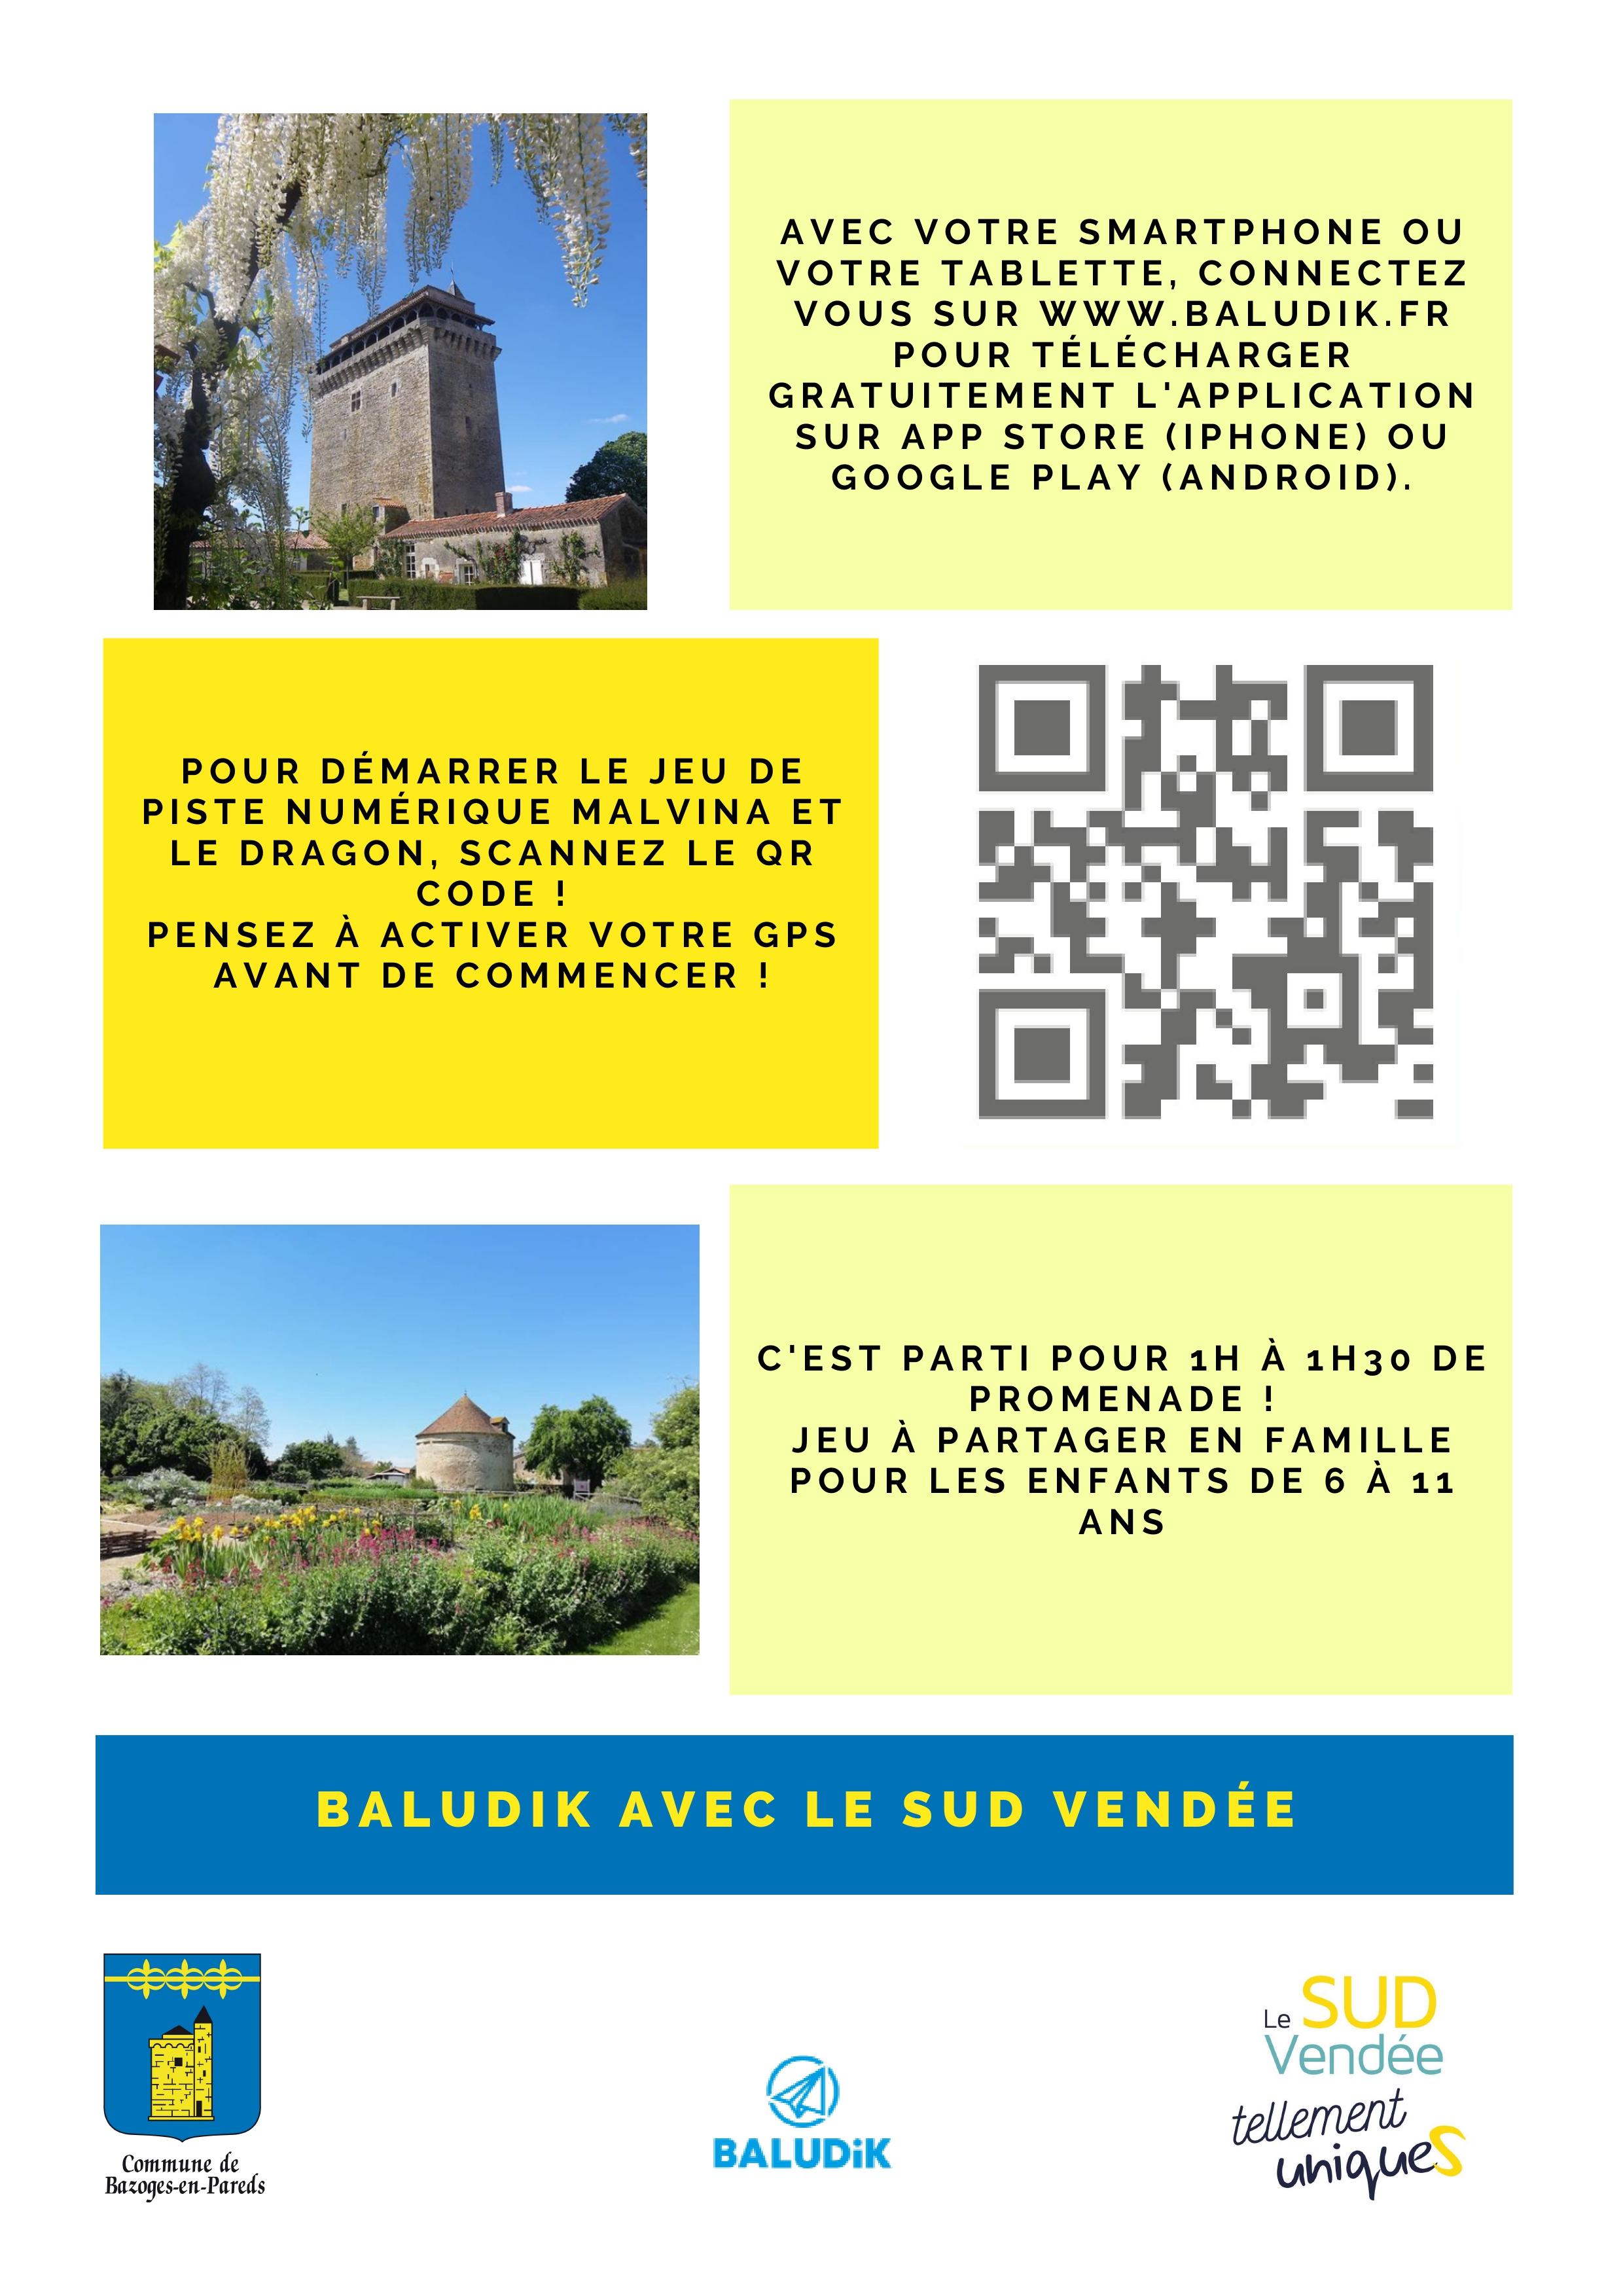 BALUDIK AVEC le sud vendée_page-0001.jpg